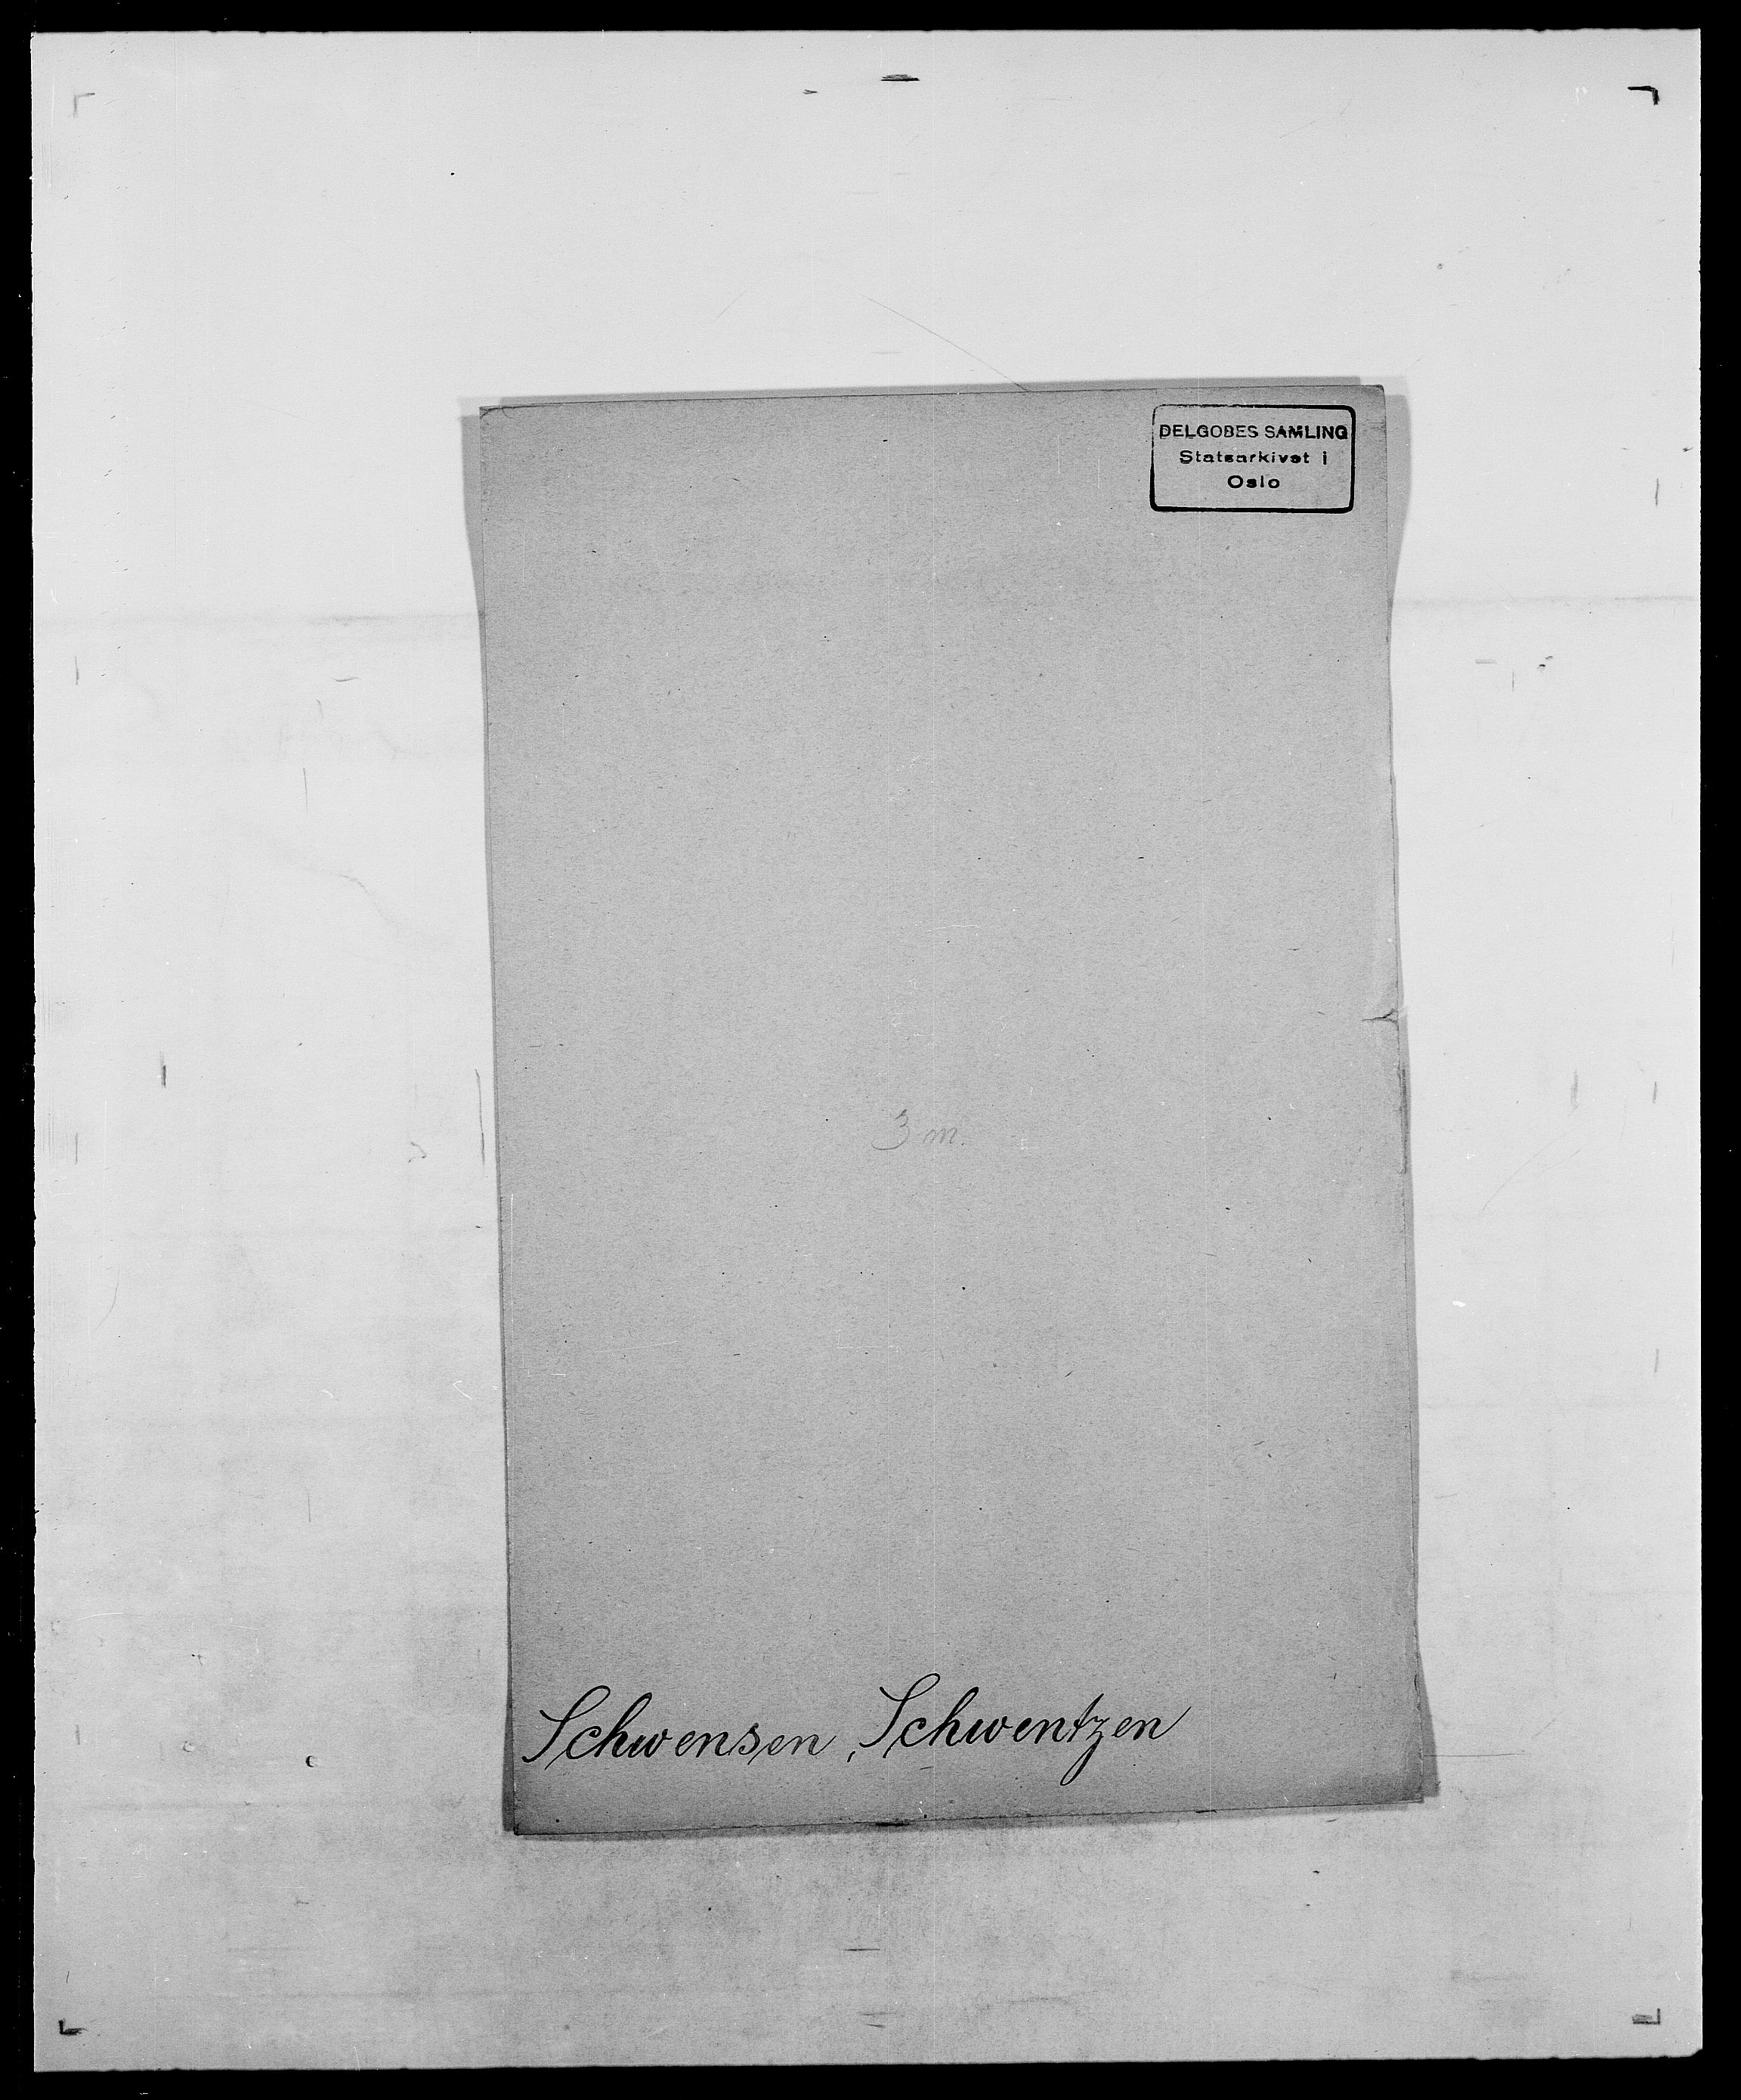 SAO, Delgobe, Charles Antoine - samling, D/Da/L0035: Schnabel - sjetman, s. 413